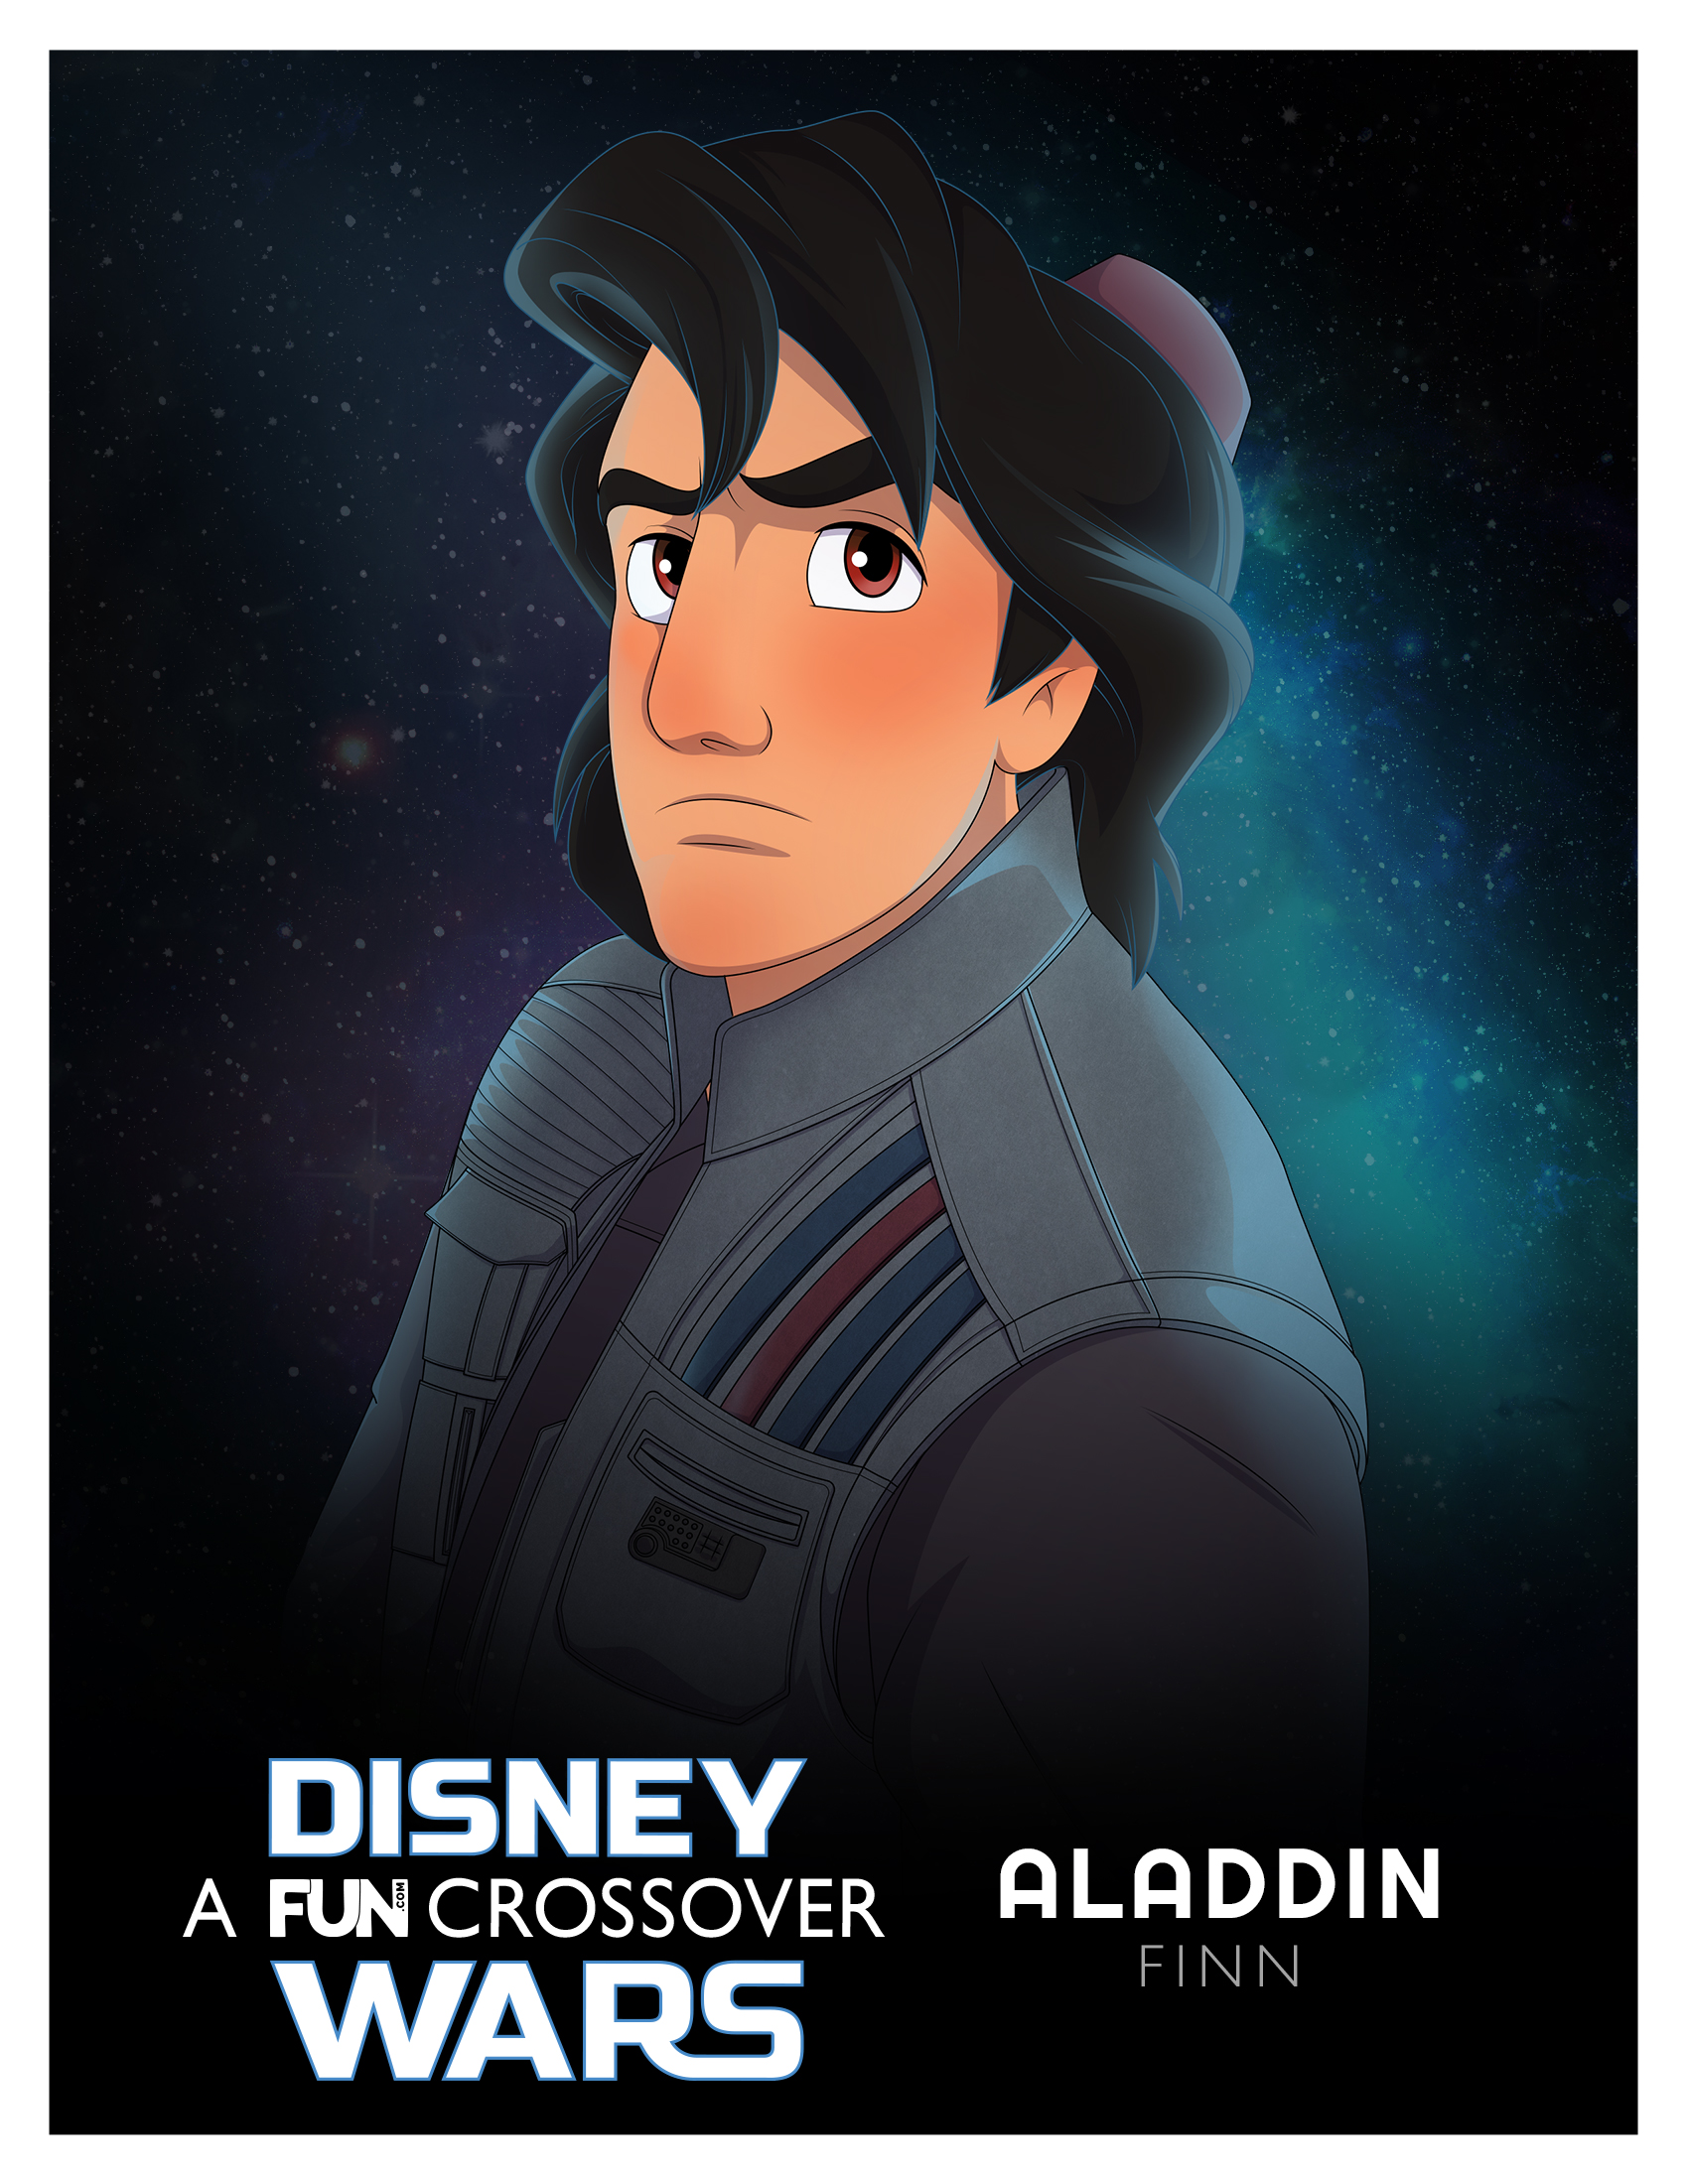 Disney Wars Aladdin Finn